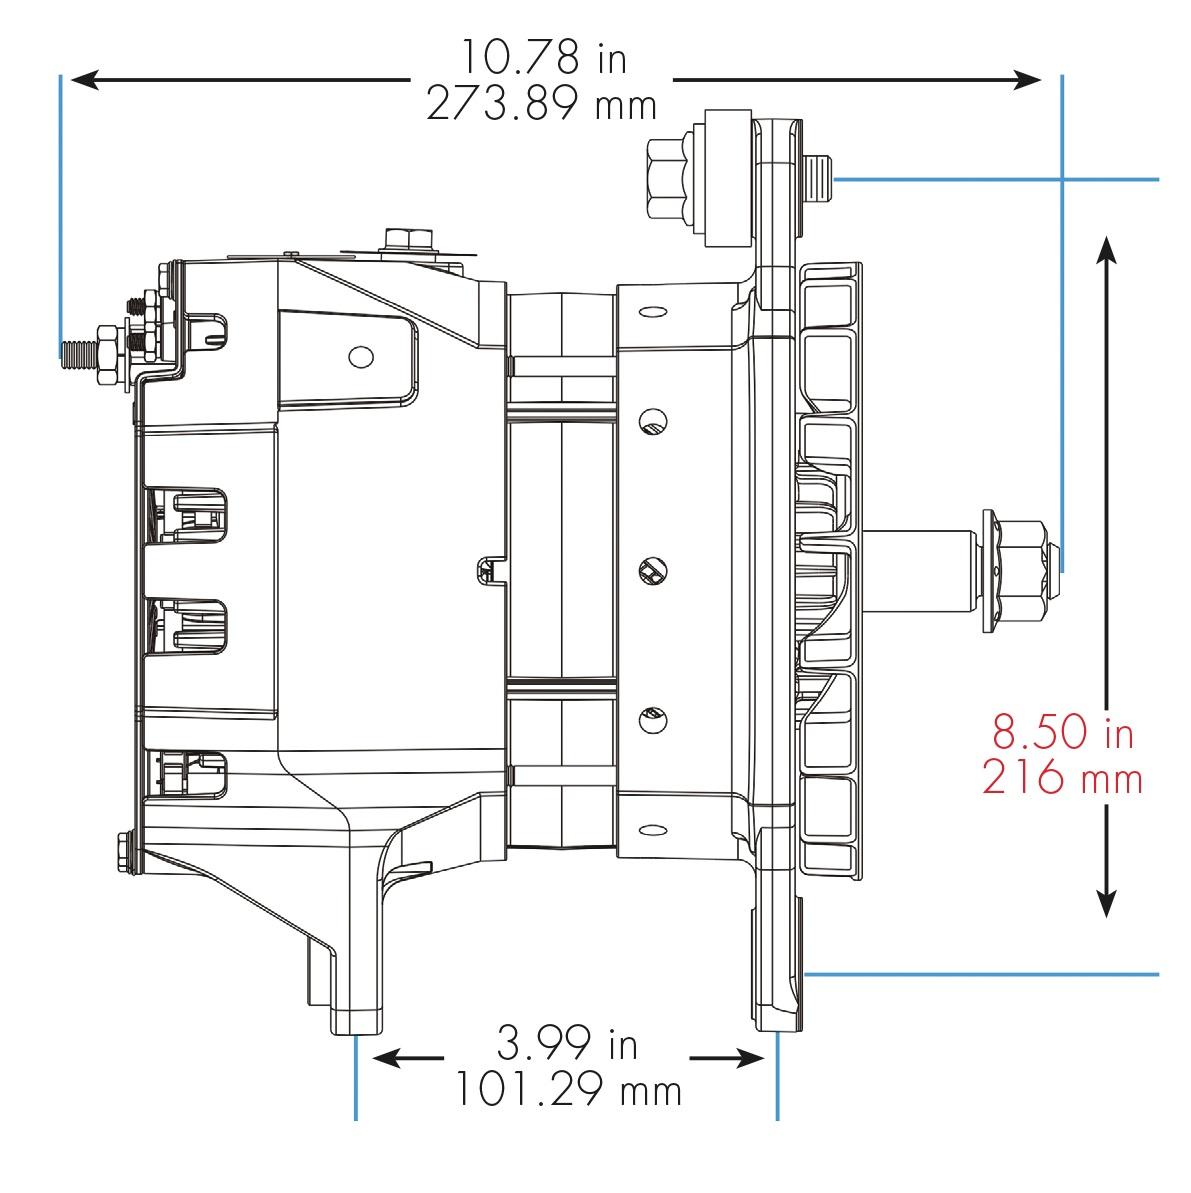 small resolution of two wire acdelco alternator wiring schematic chevy 4 wire delco alternator farmall 706 wiring diagram